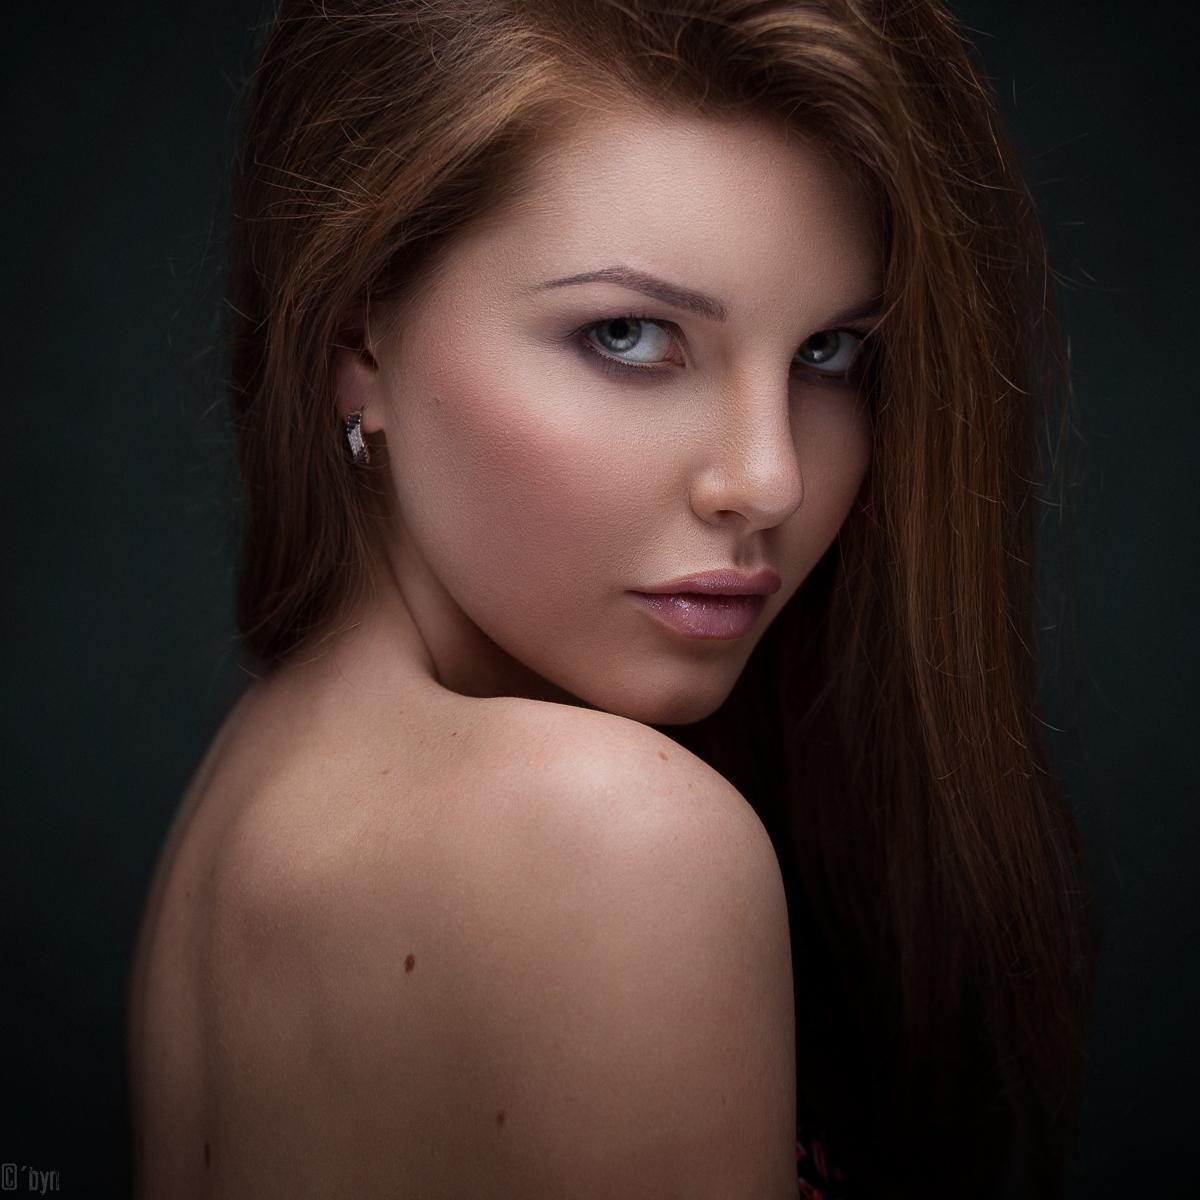 Elena by cbyn